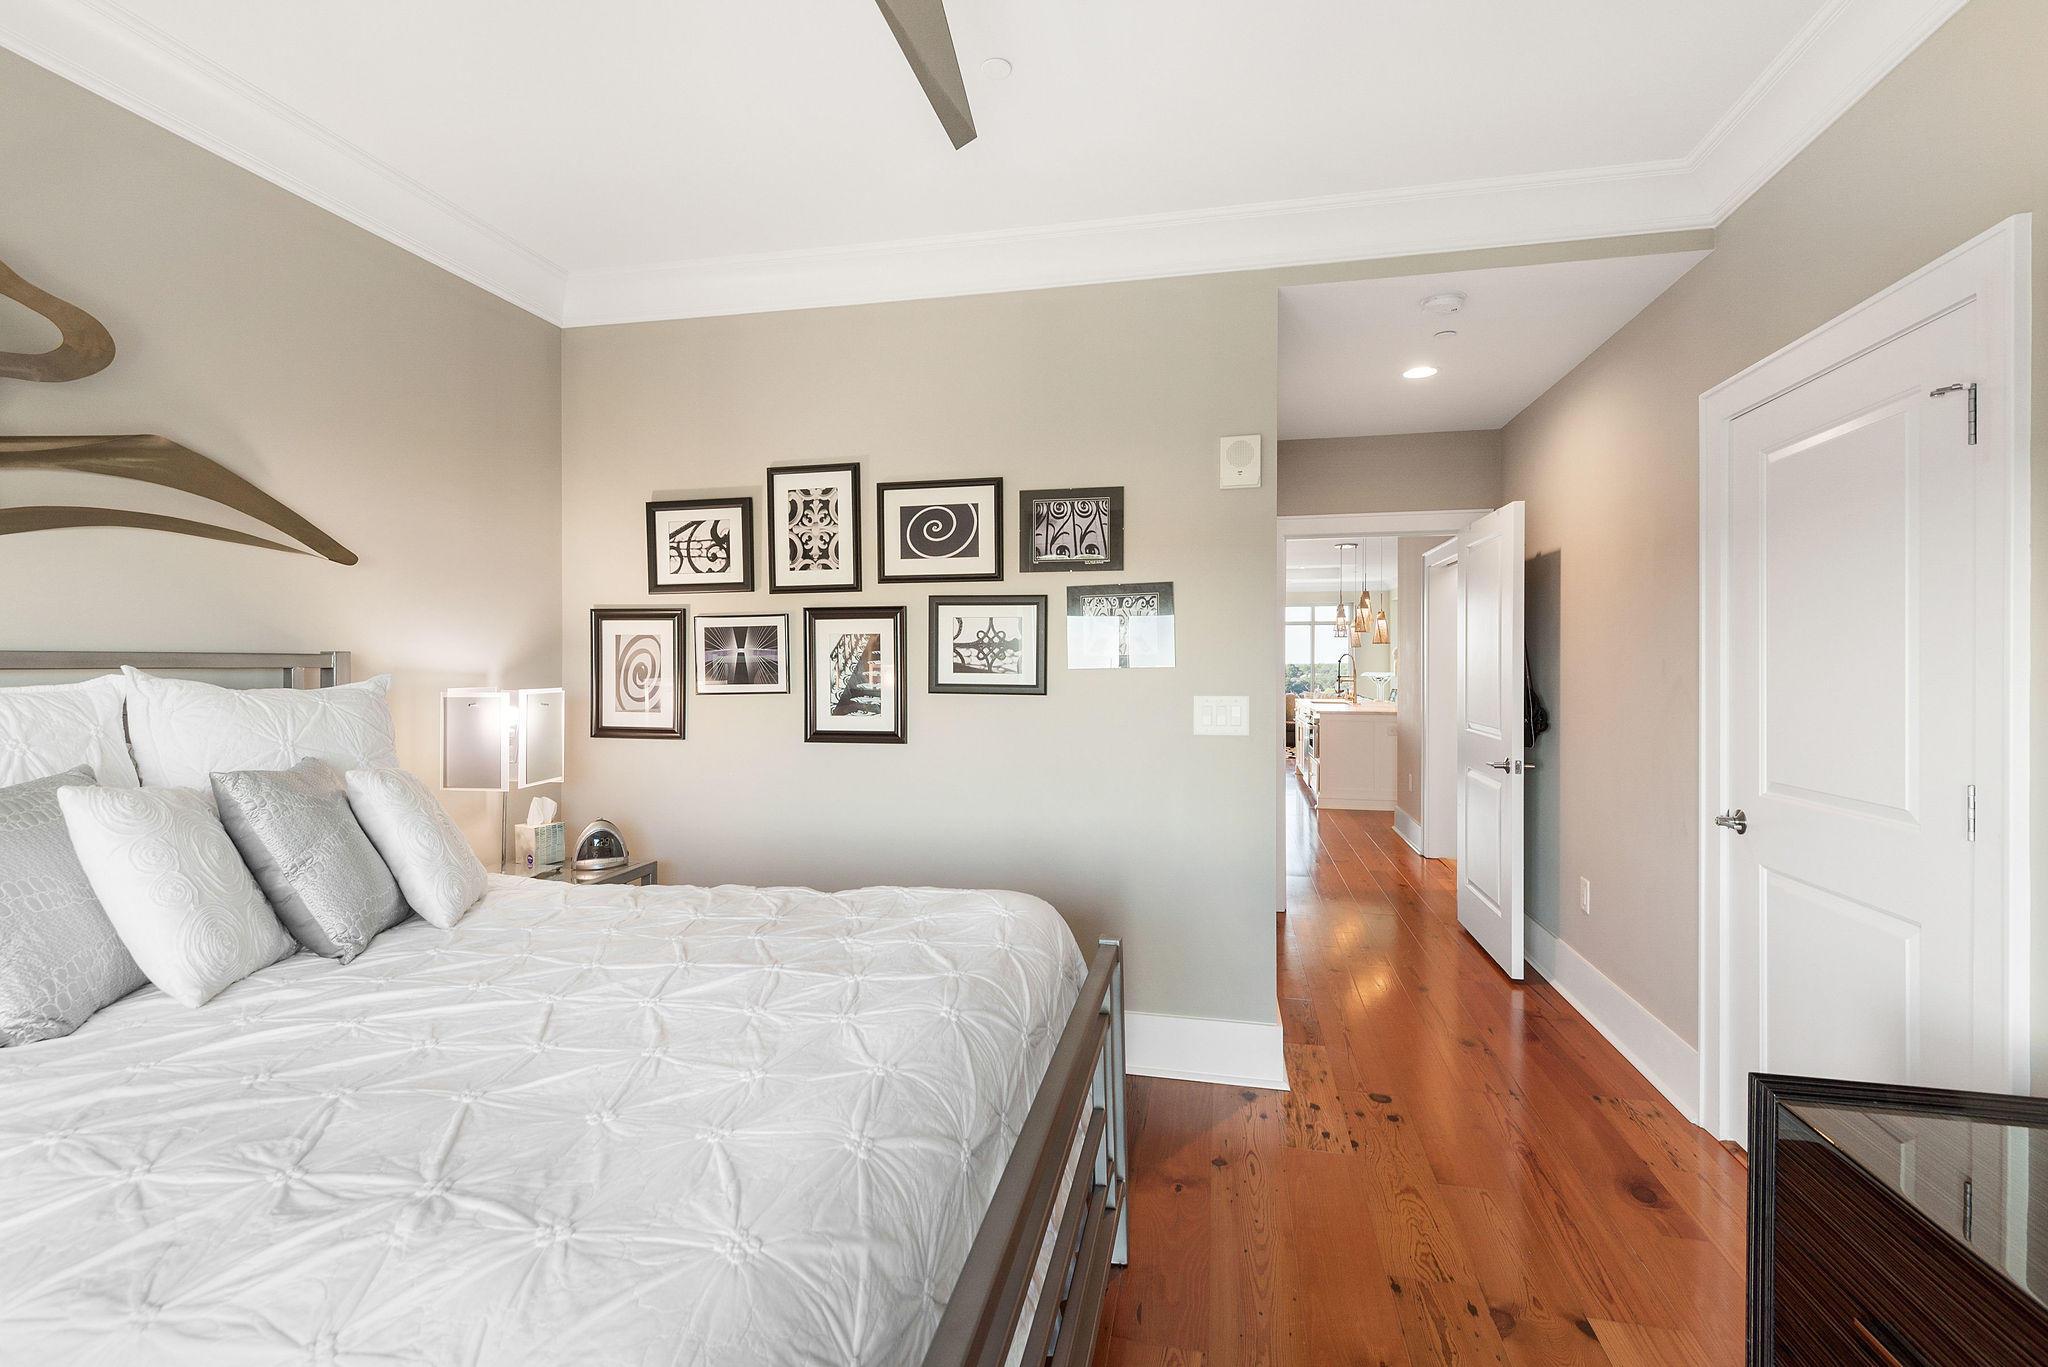 Tides IV Condominiums Homes For Sale - 155 Wingo, Mount Pleasant, SC - 25